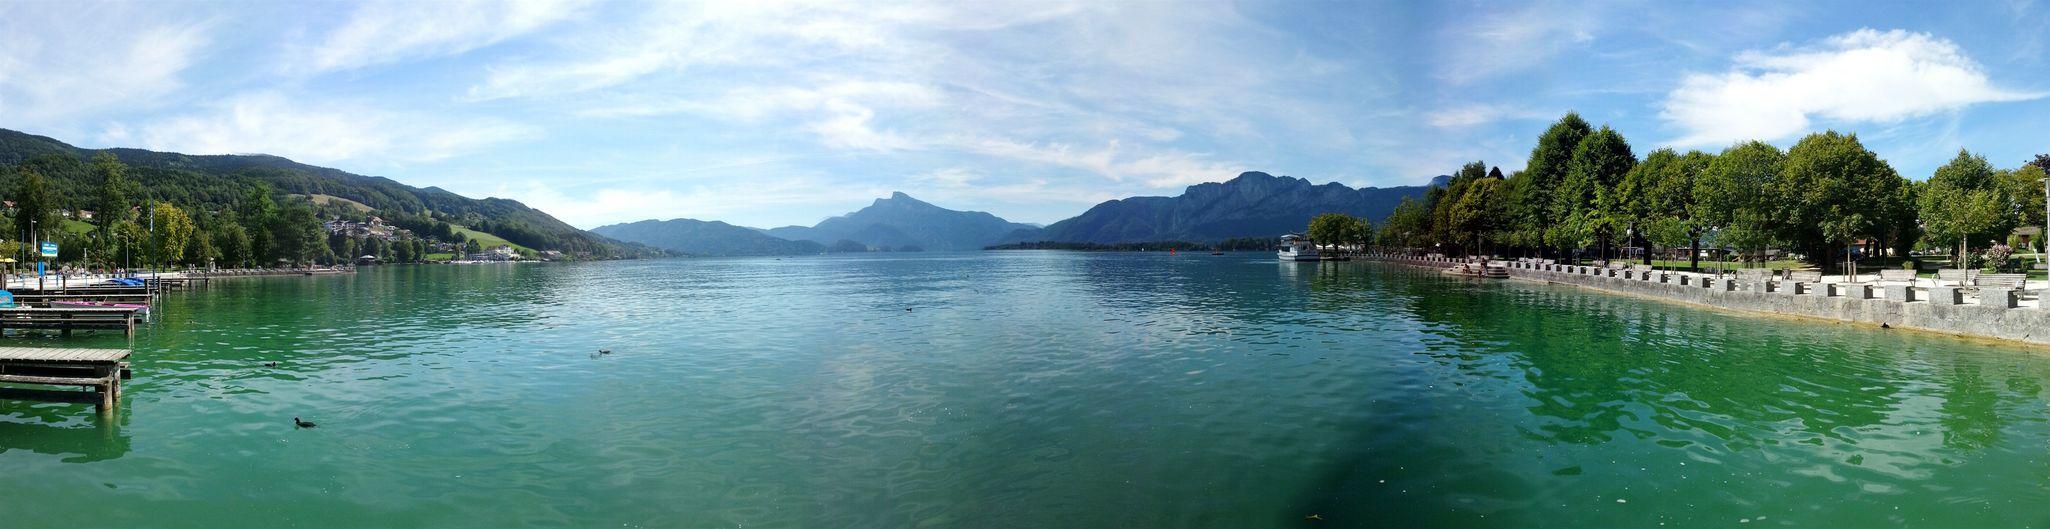 Mondsee Panorama Lake View